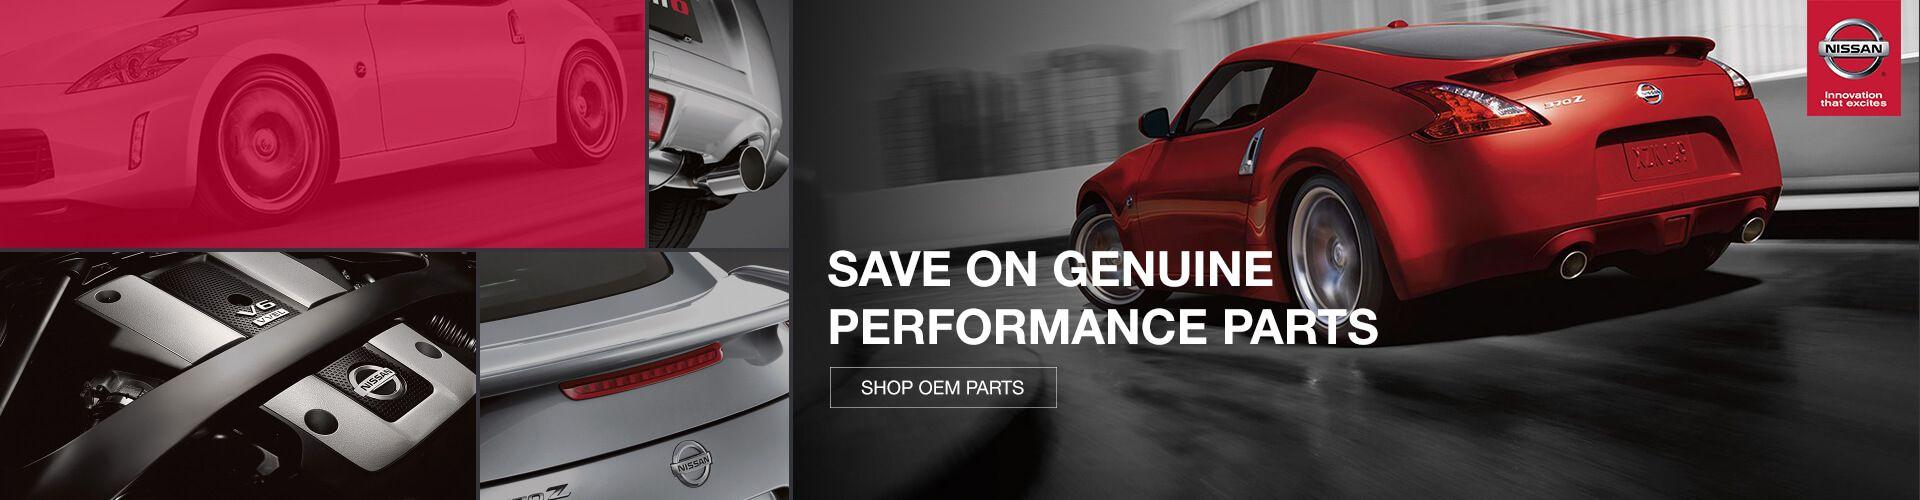 Nissan OEM Performance Parts